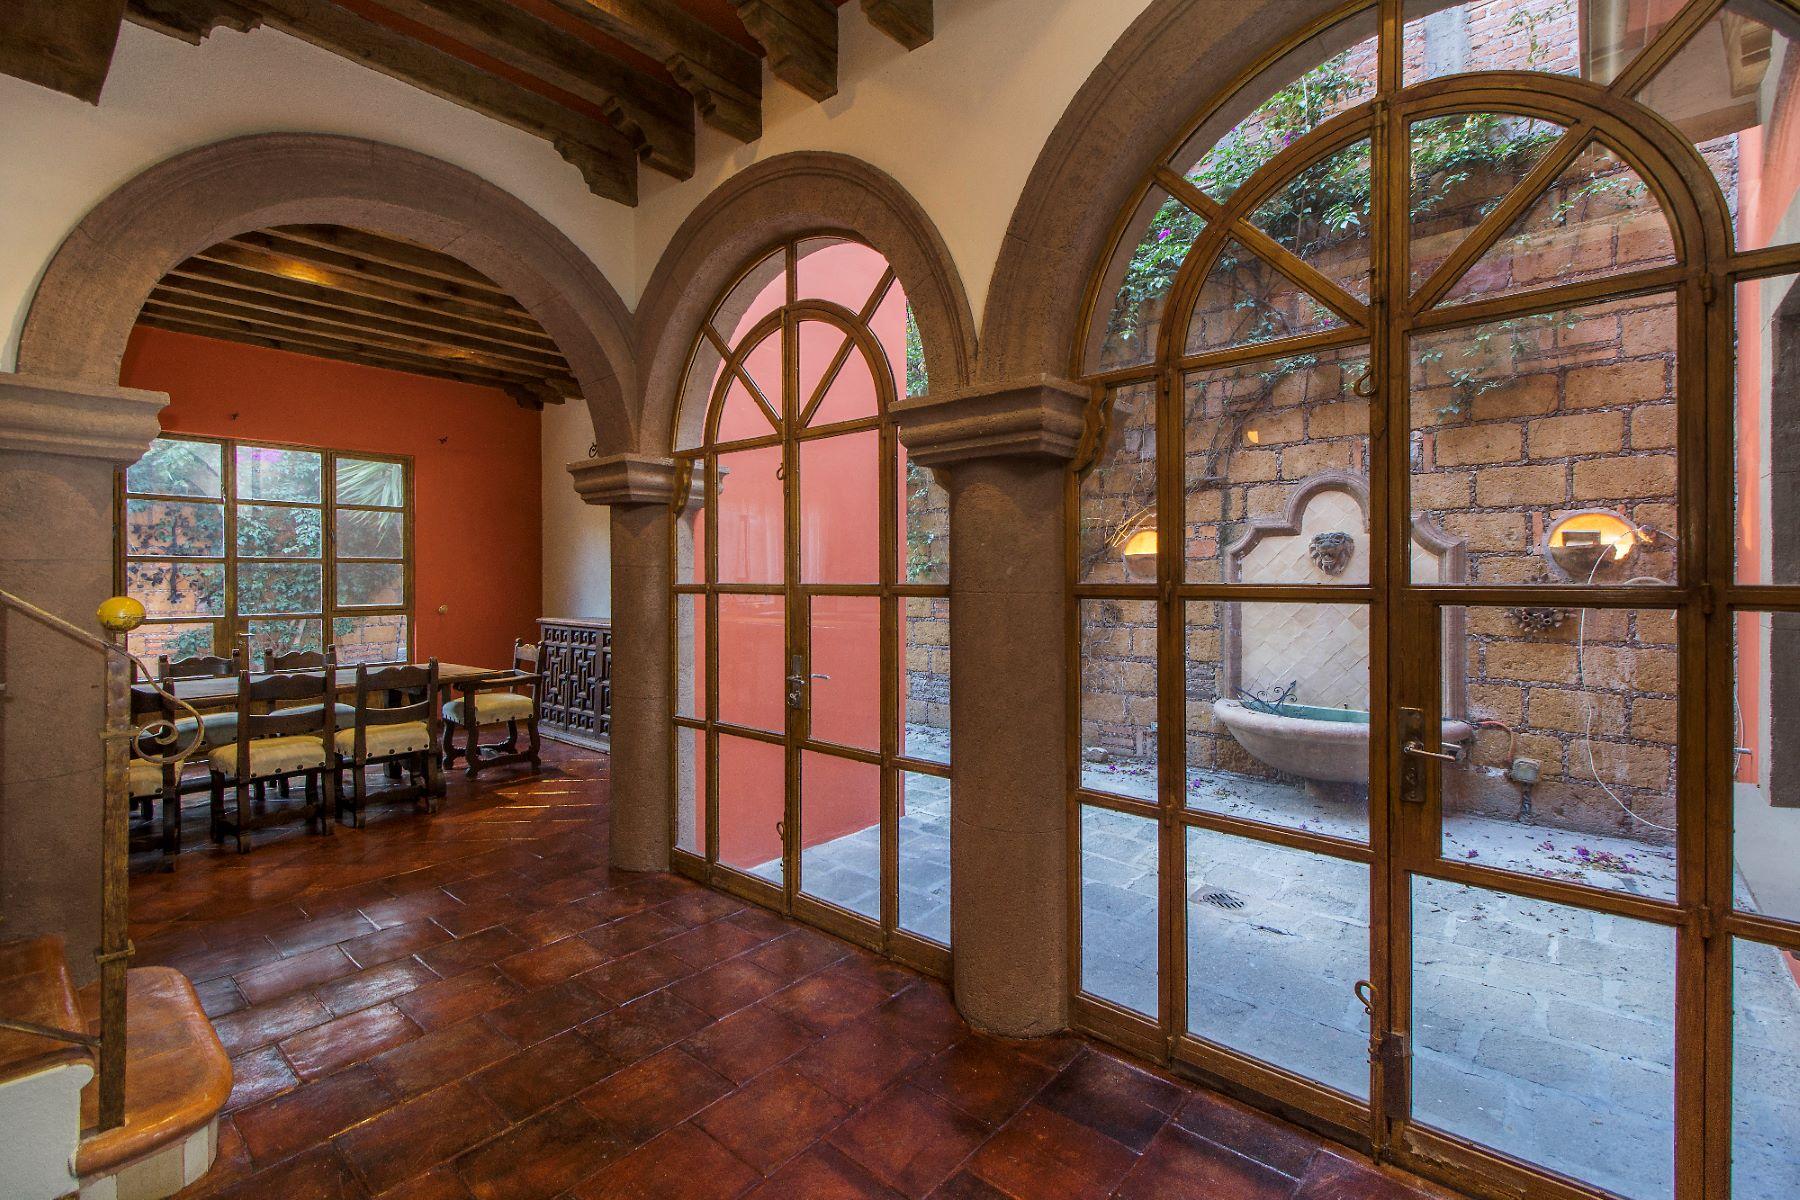 Single Family Home for Sale at Casa Caracol Allende, San Miguel De Allende, Guanajuato Mexico